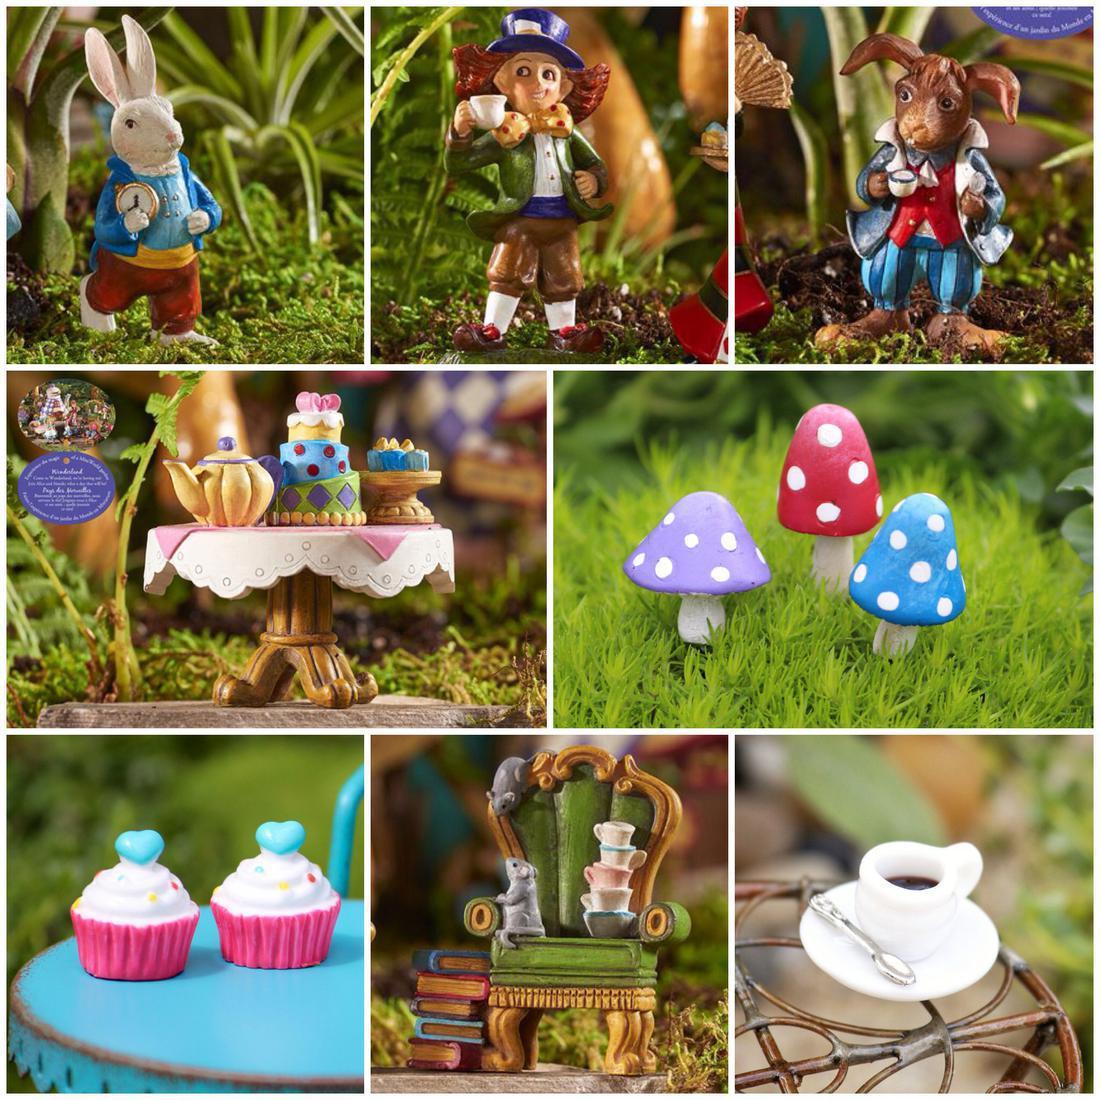 Fairy Gardens Wa Australia Miniature Fairies Furniture Accessories Houses And More My